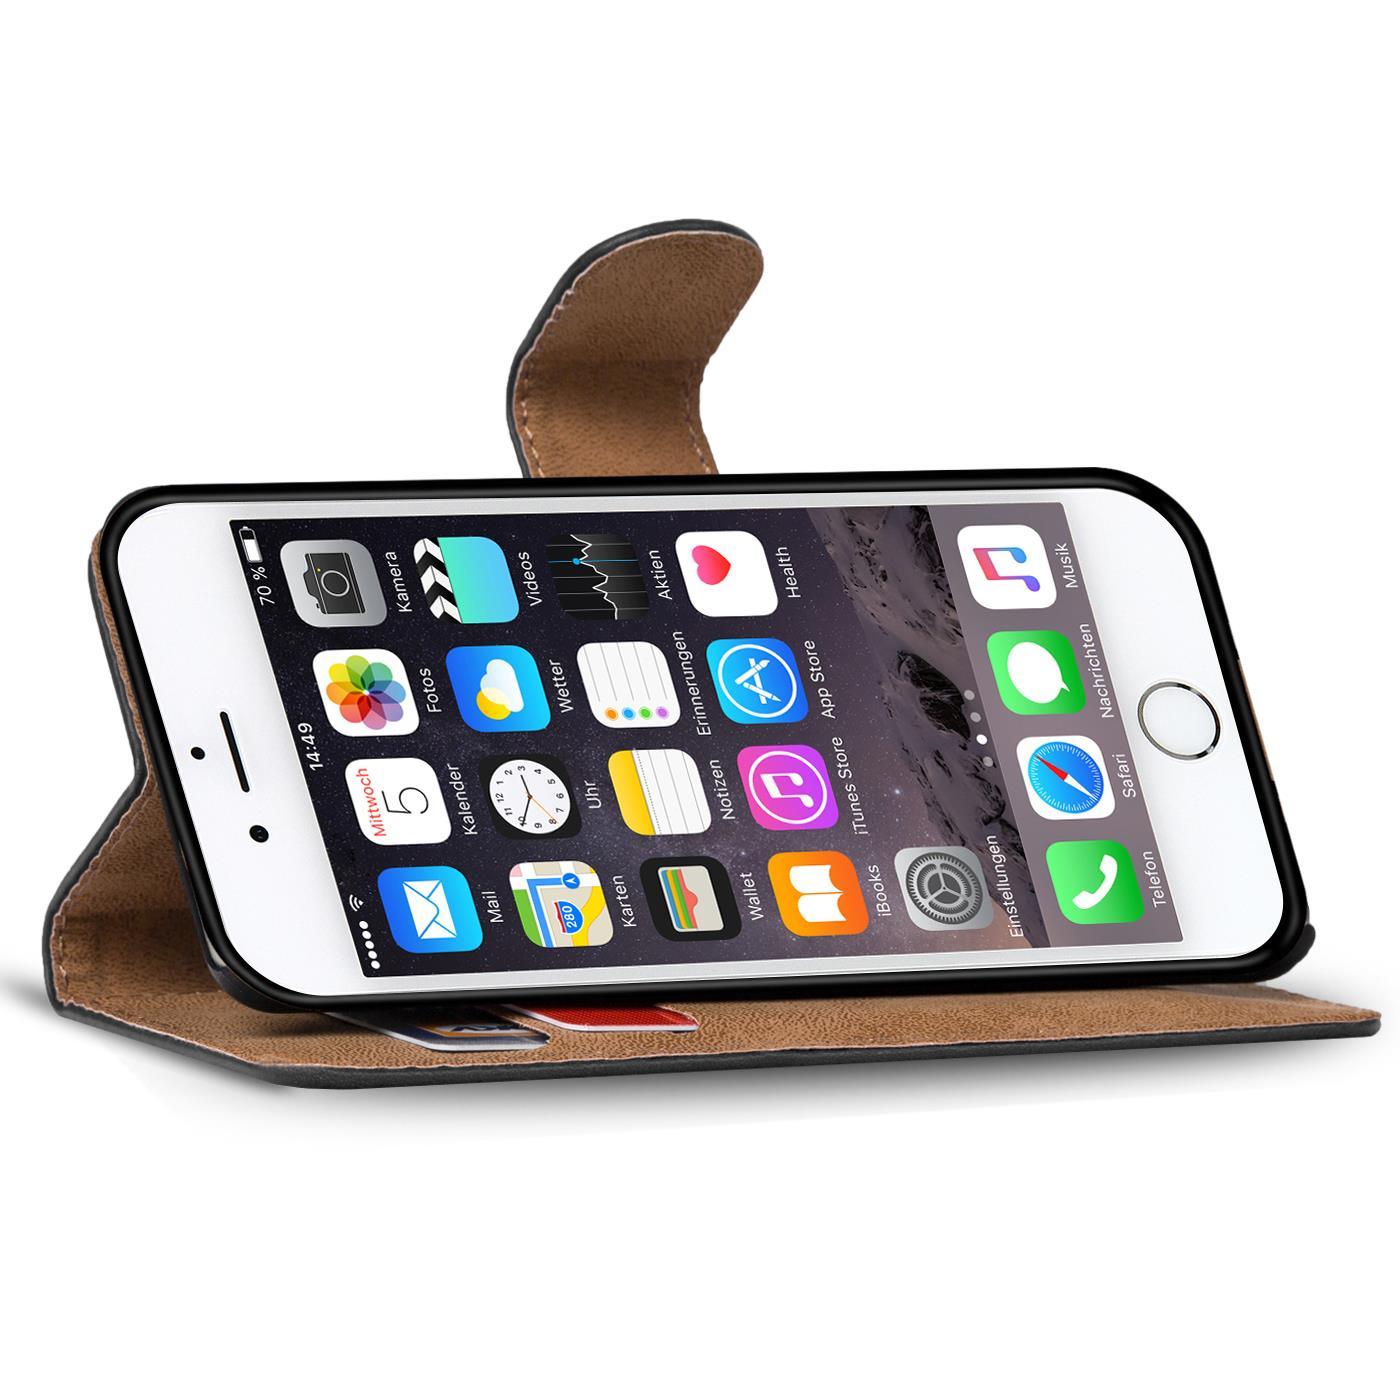 book case apple iphone 6 6s plus 5 5 h lle klapph lle handy tasche flip cover 4058455366161 ebay. Black Bedroom Furniture Sets. Home Design Ideas